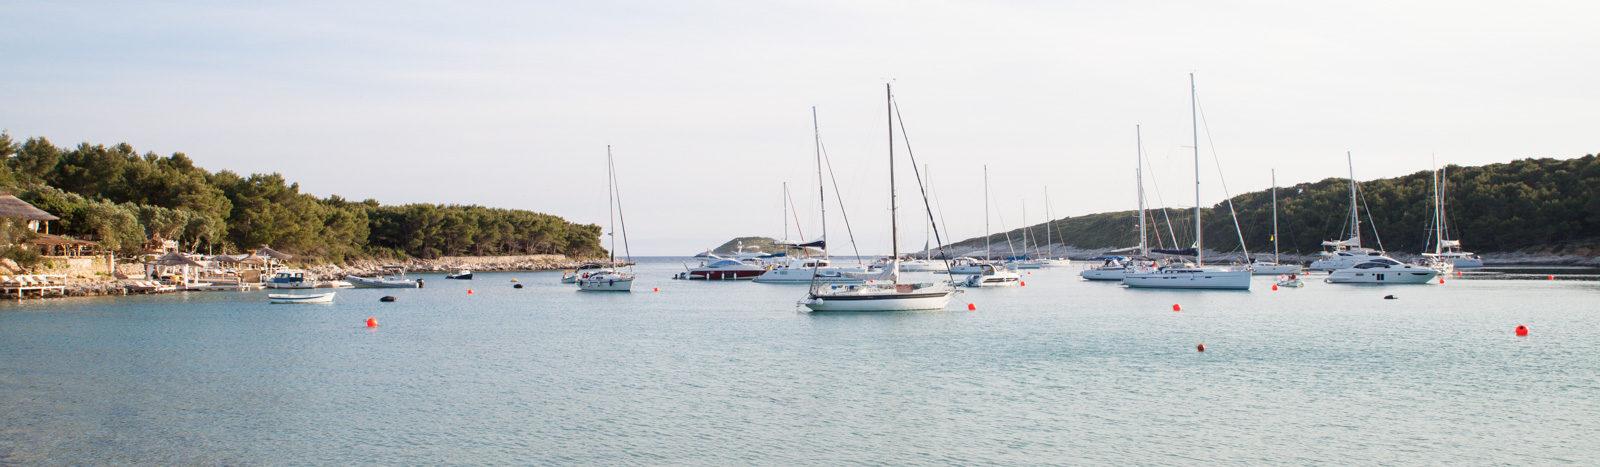 Croatia S Most Idyllic Islands Farfelue